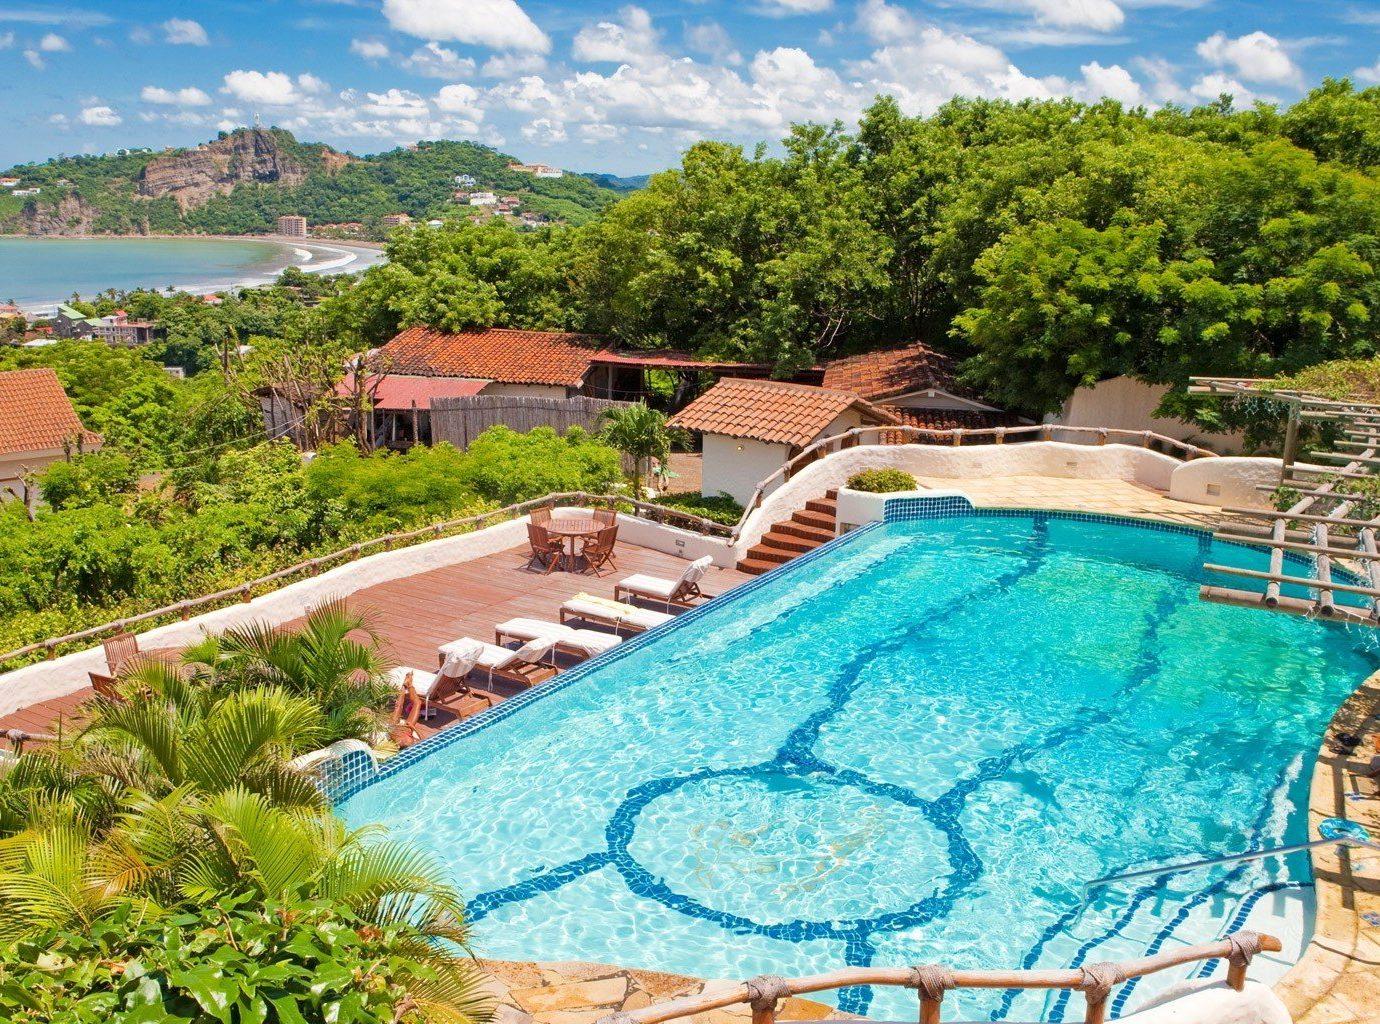 Trip Ideas outdoor swimming pool property leisure Resort estate vacation Villa real estate backyard Garden